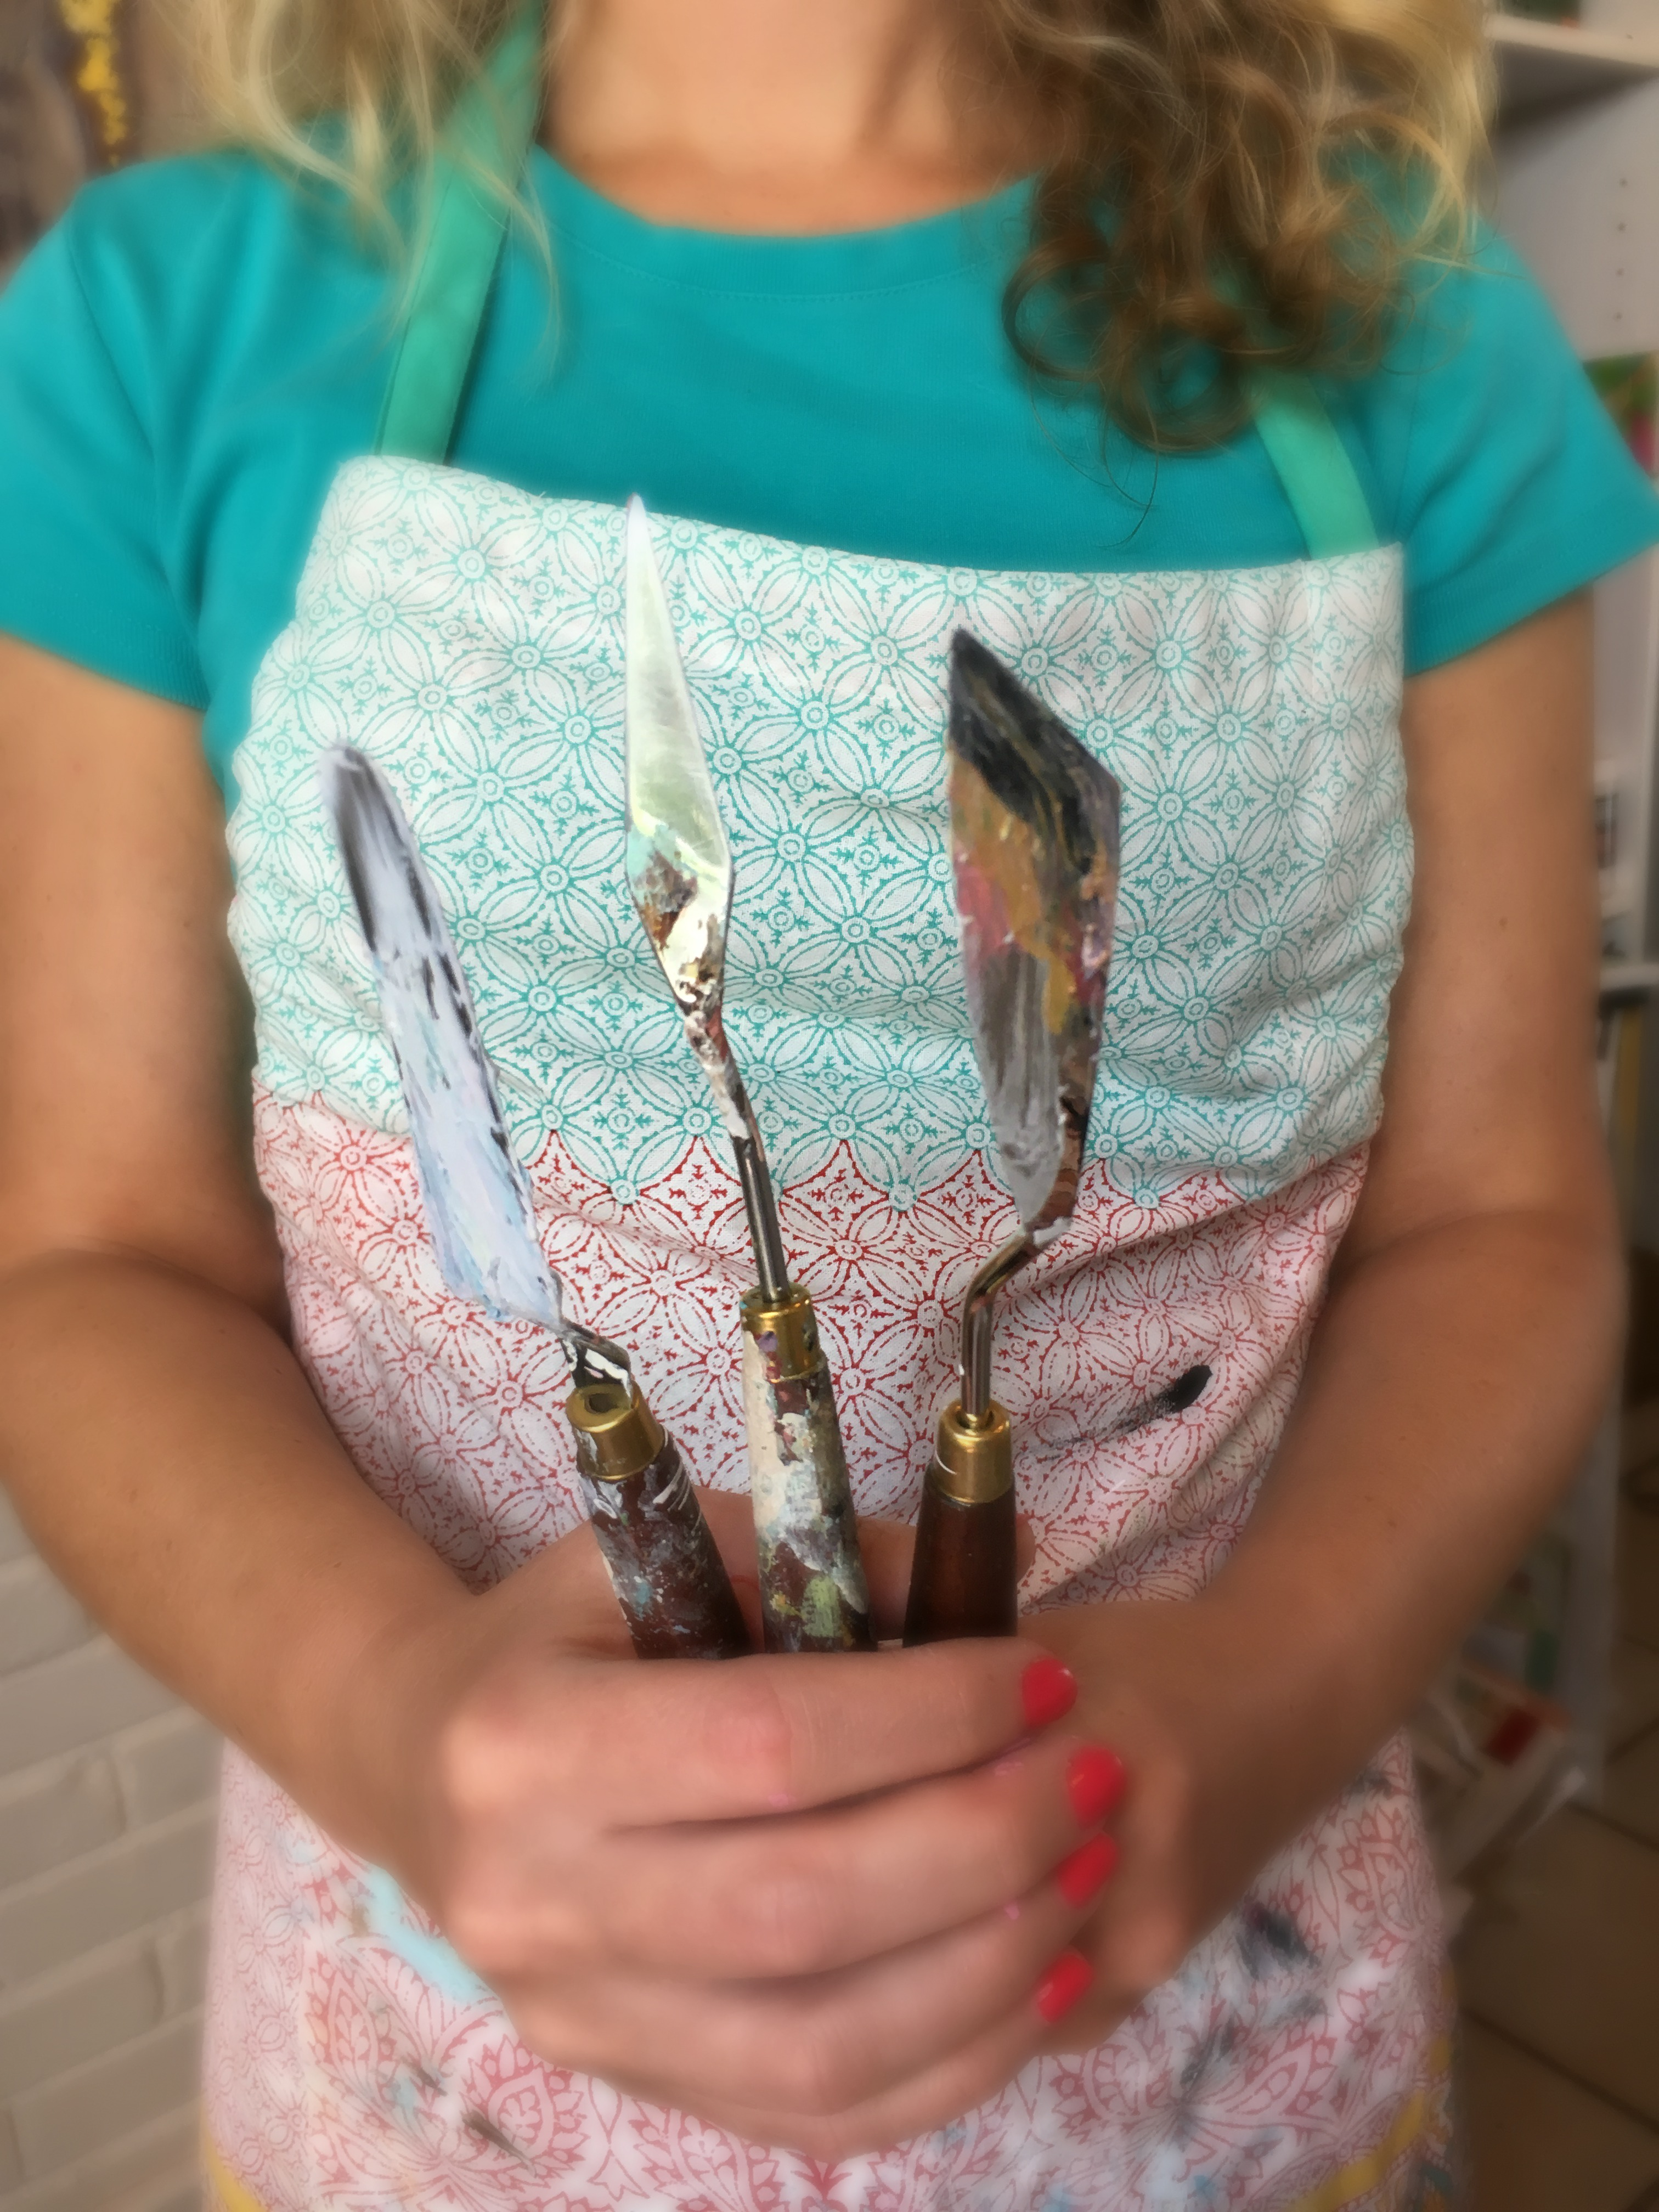 Palette Knife Painting Amanda Hilburn